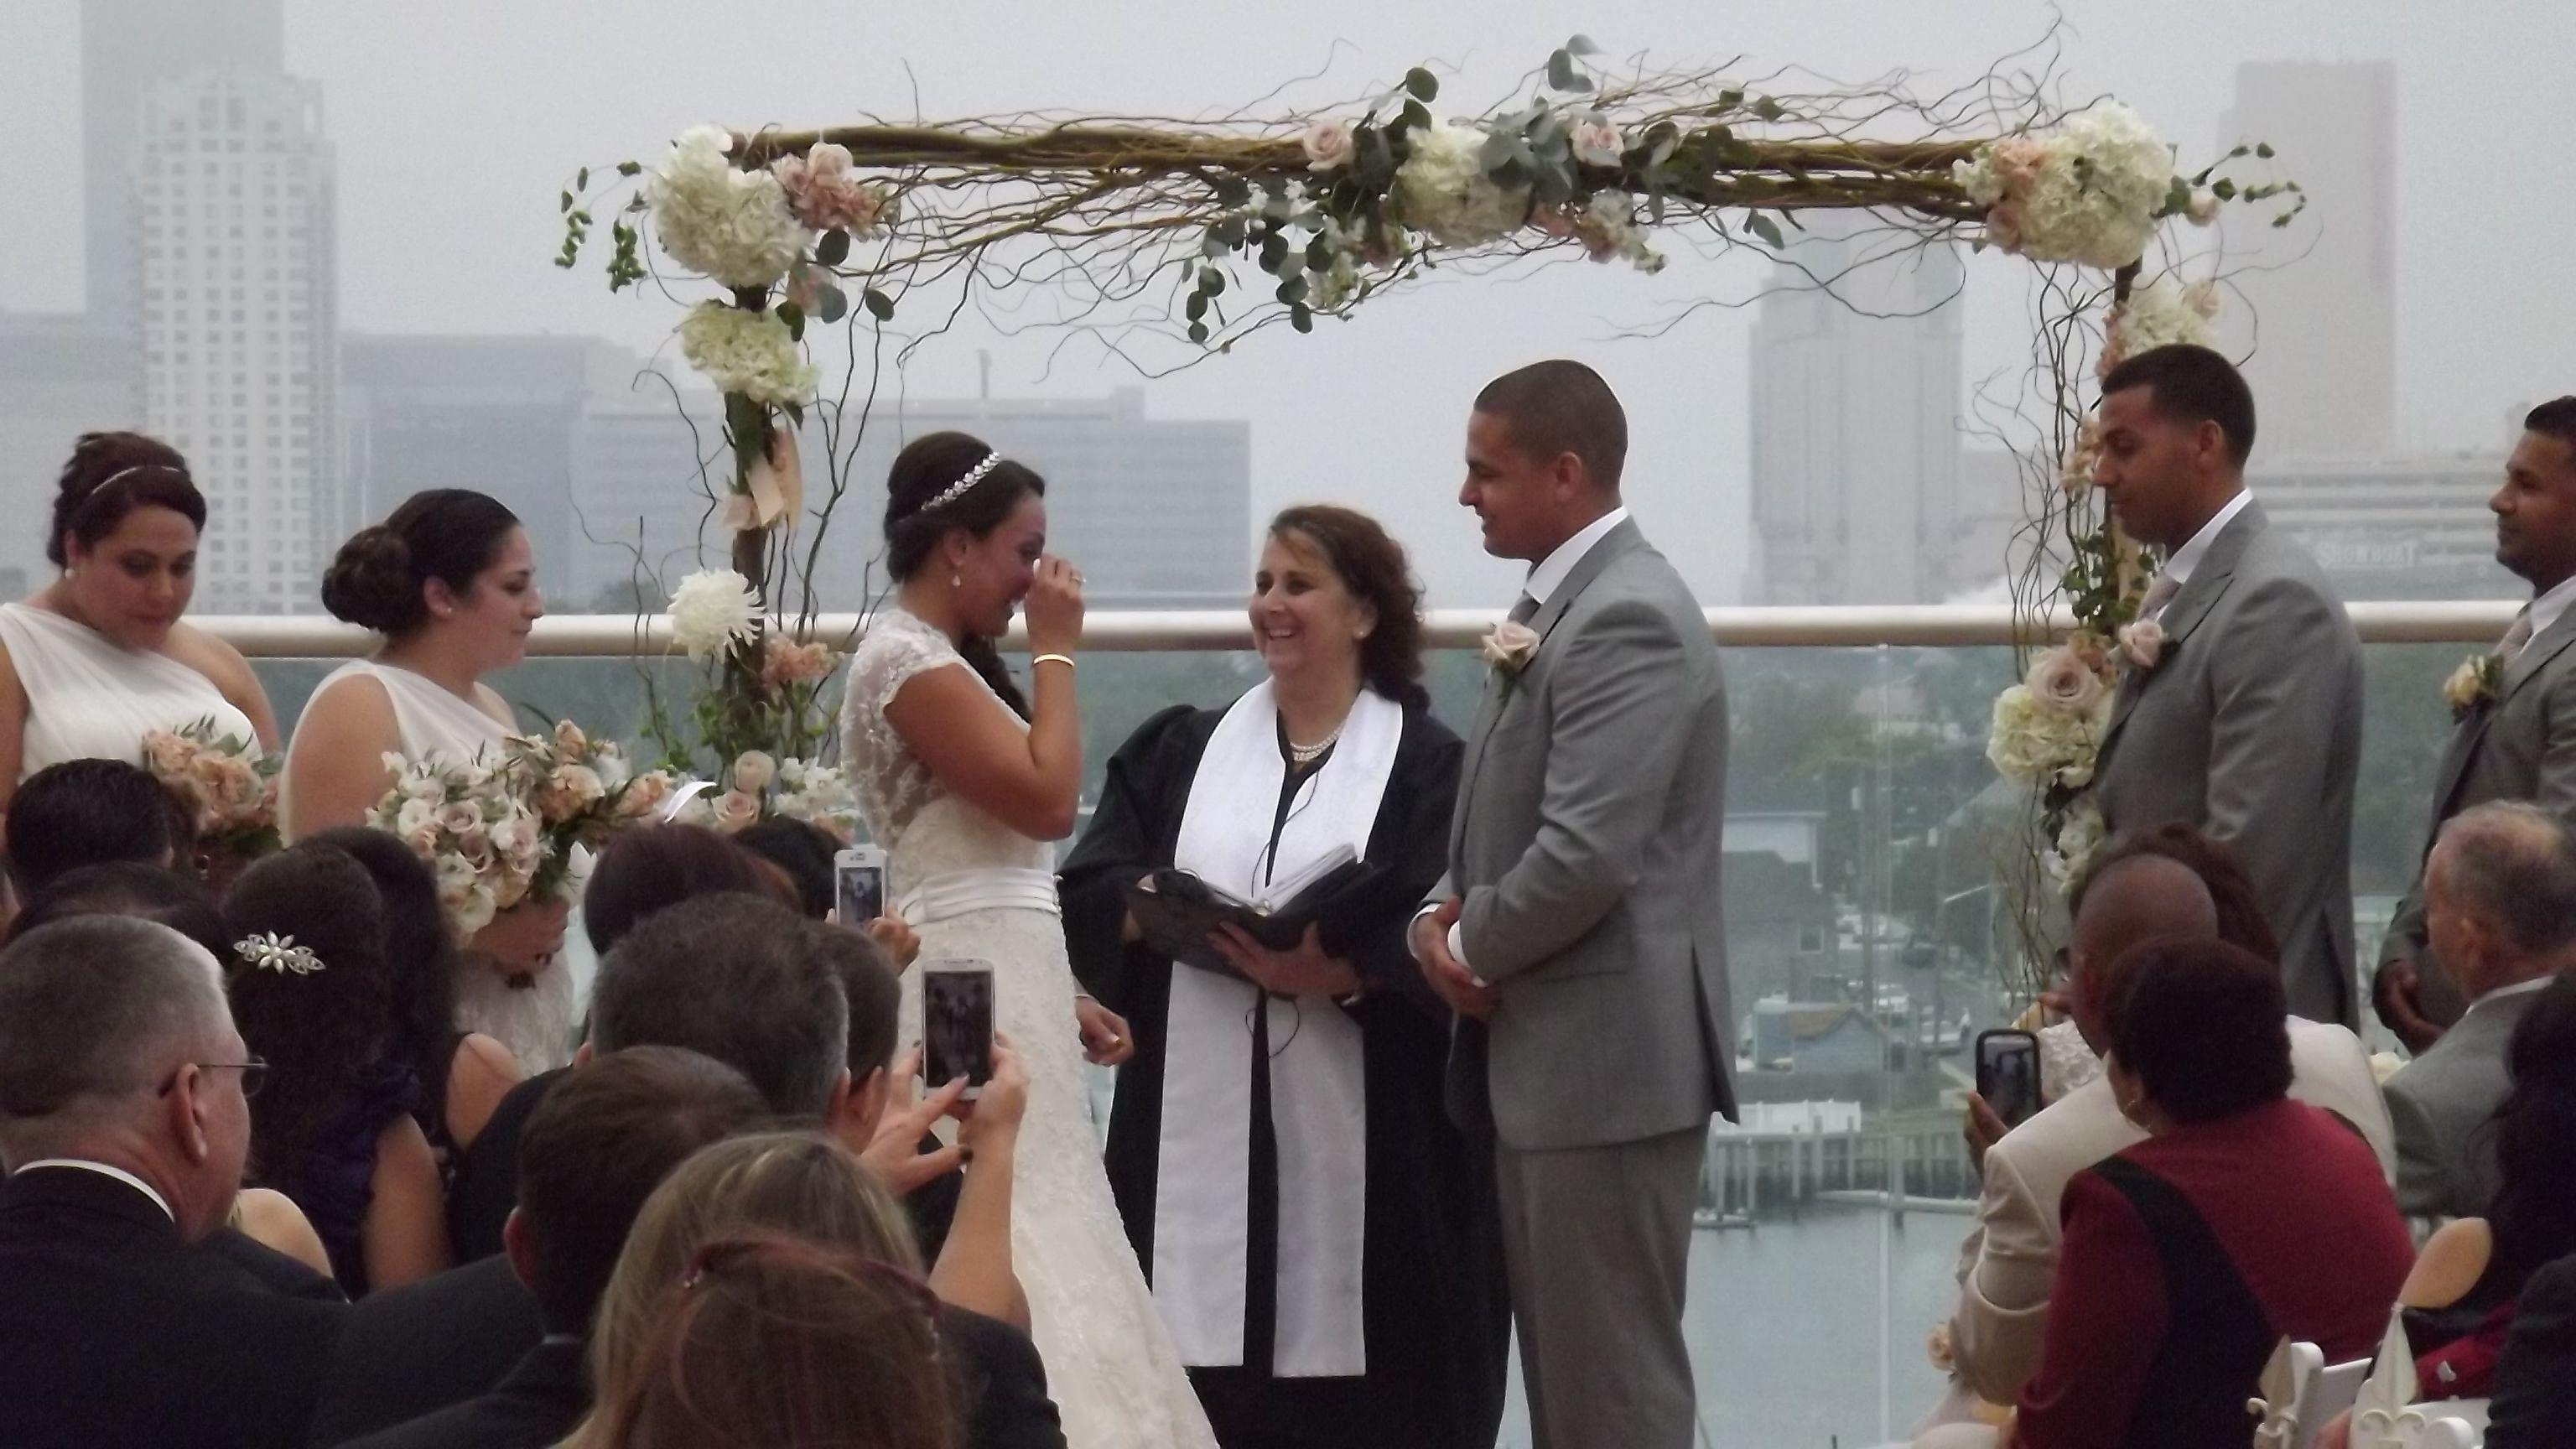 wedding officiant newark nj